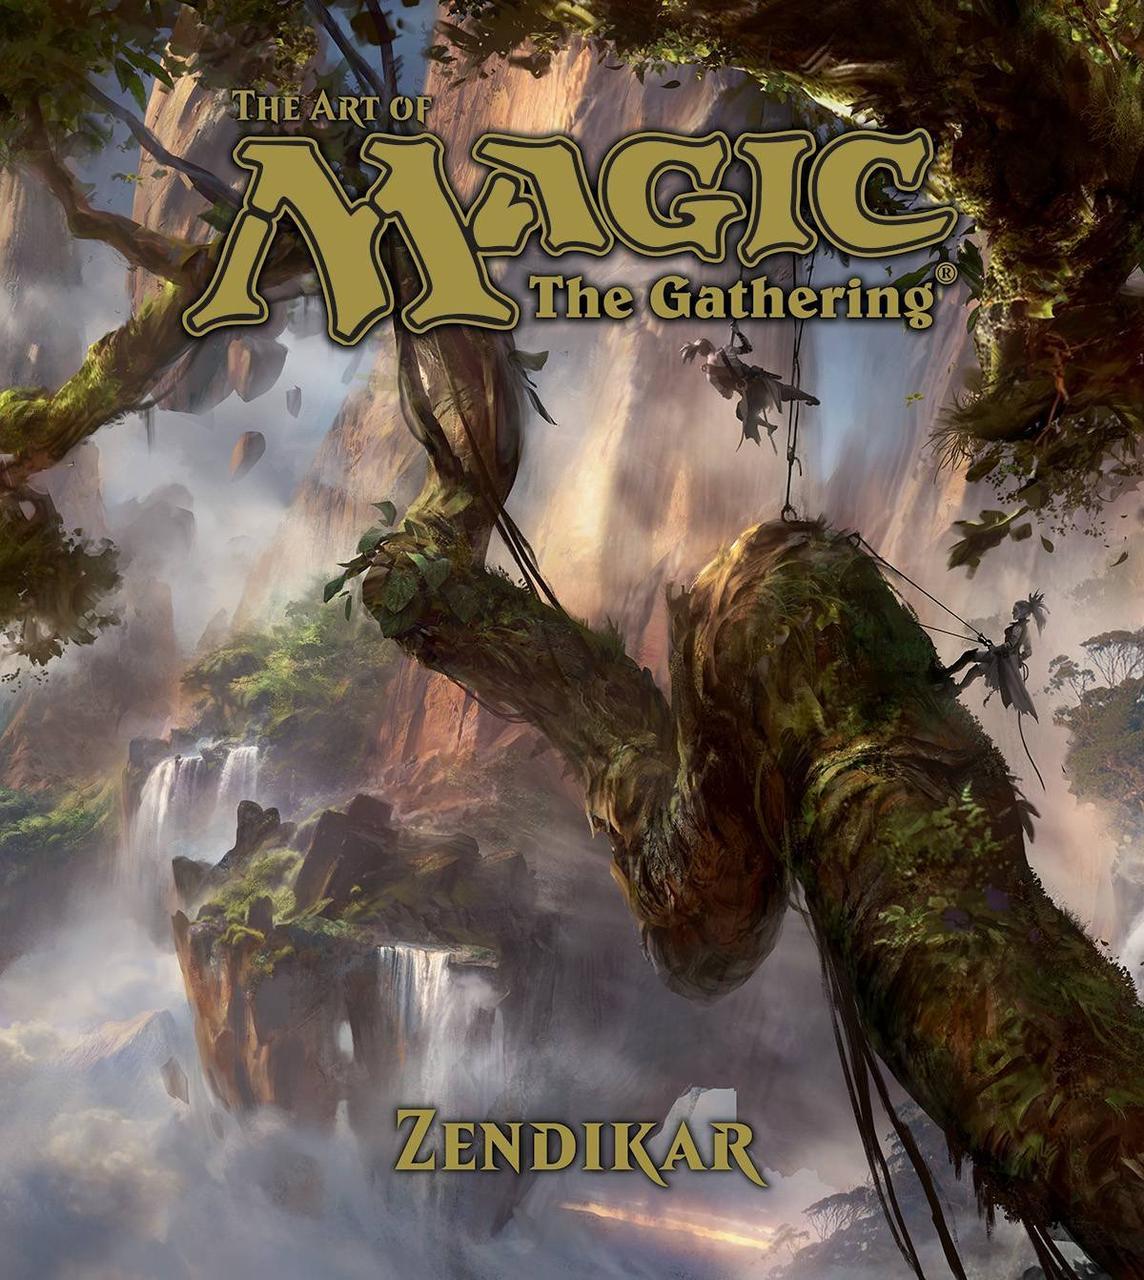 The Art of Magic: The Gathering - Zendikar (1) by James Wyatt